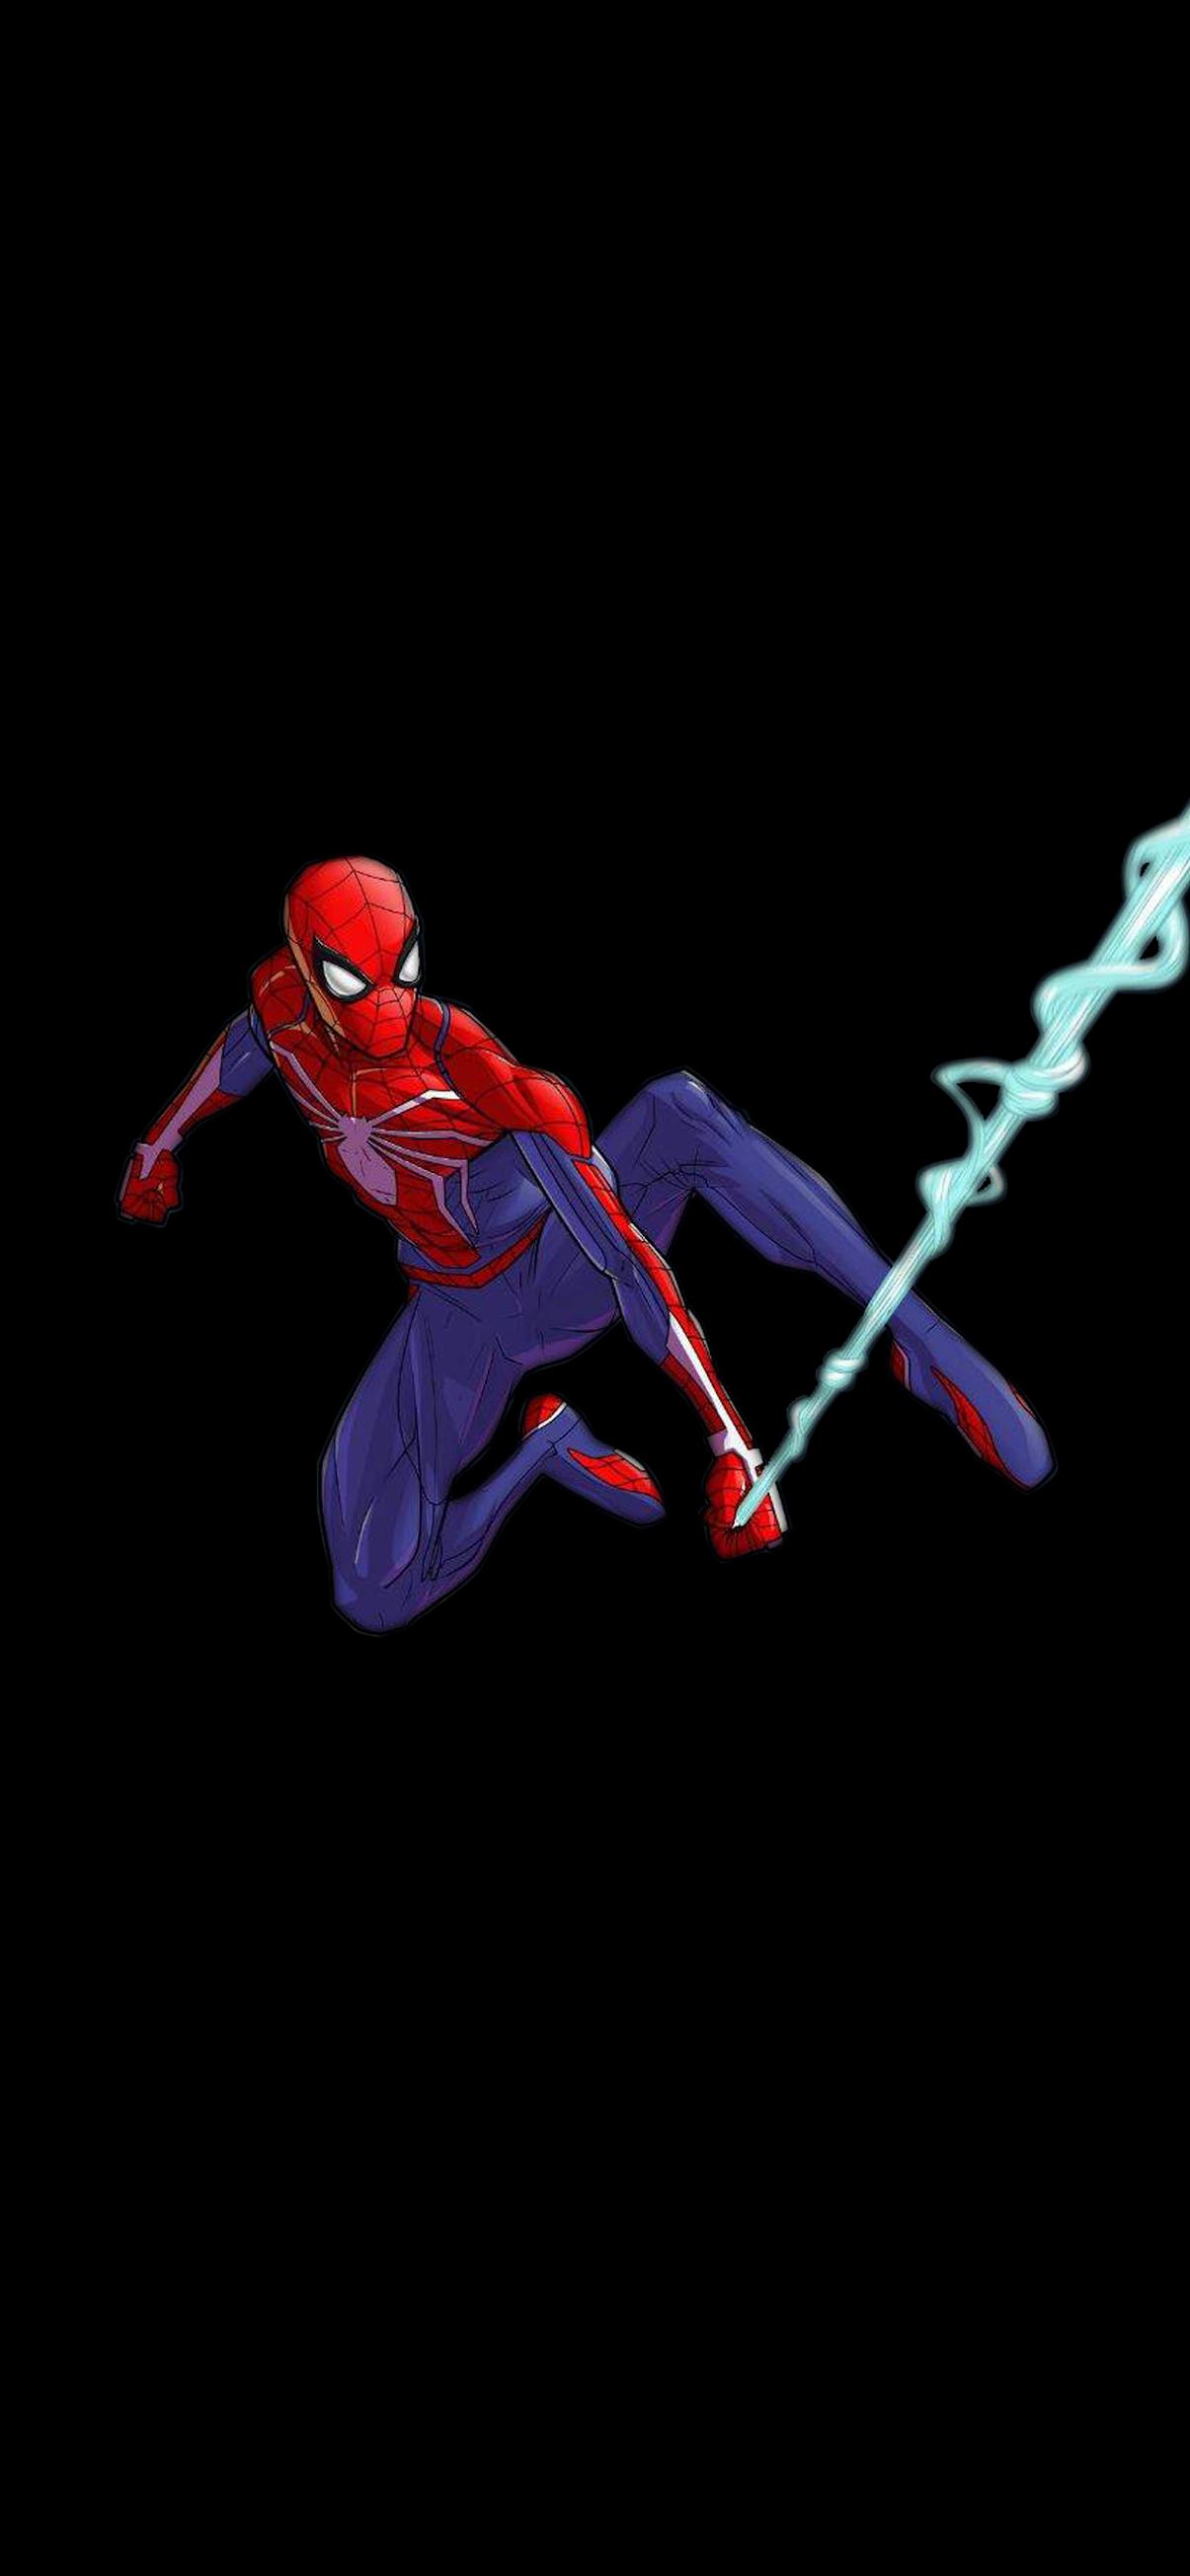 spider man using web